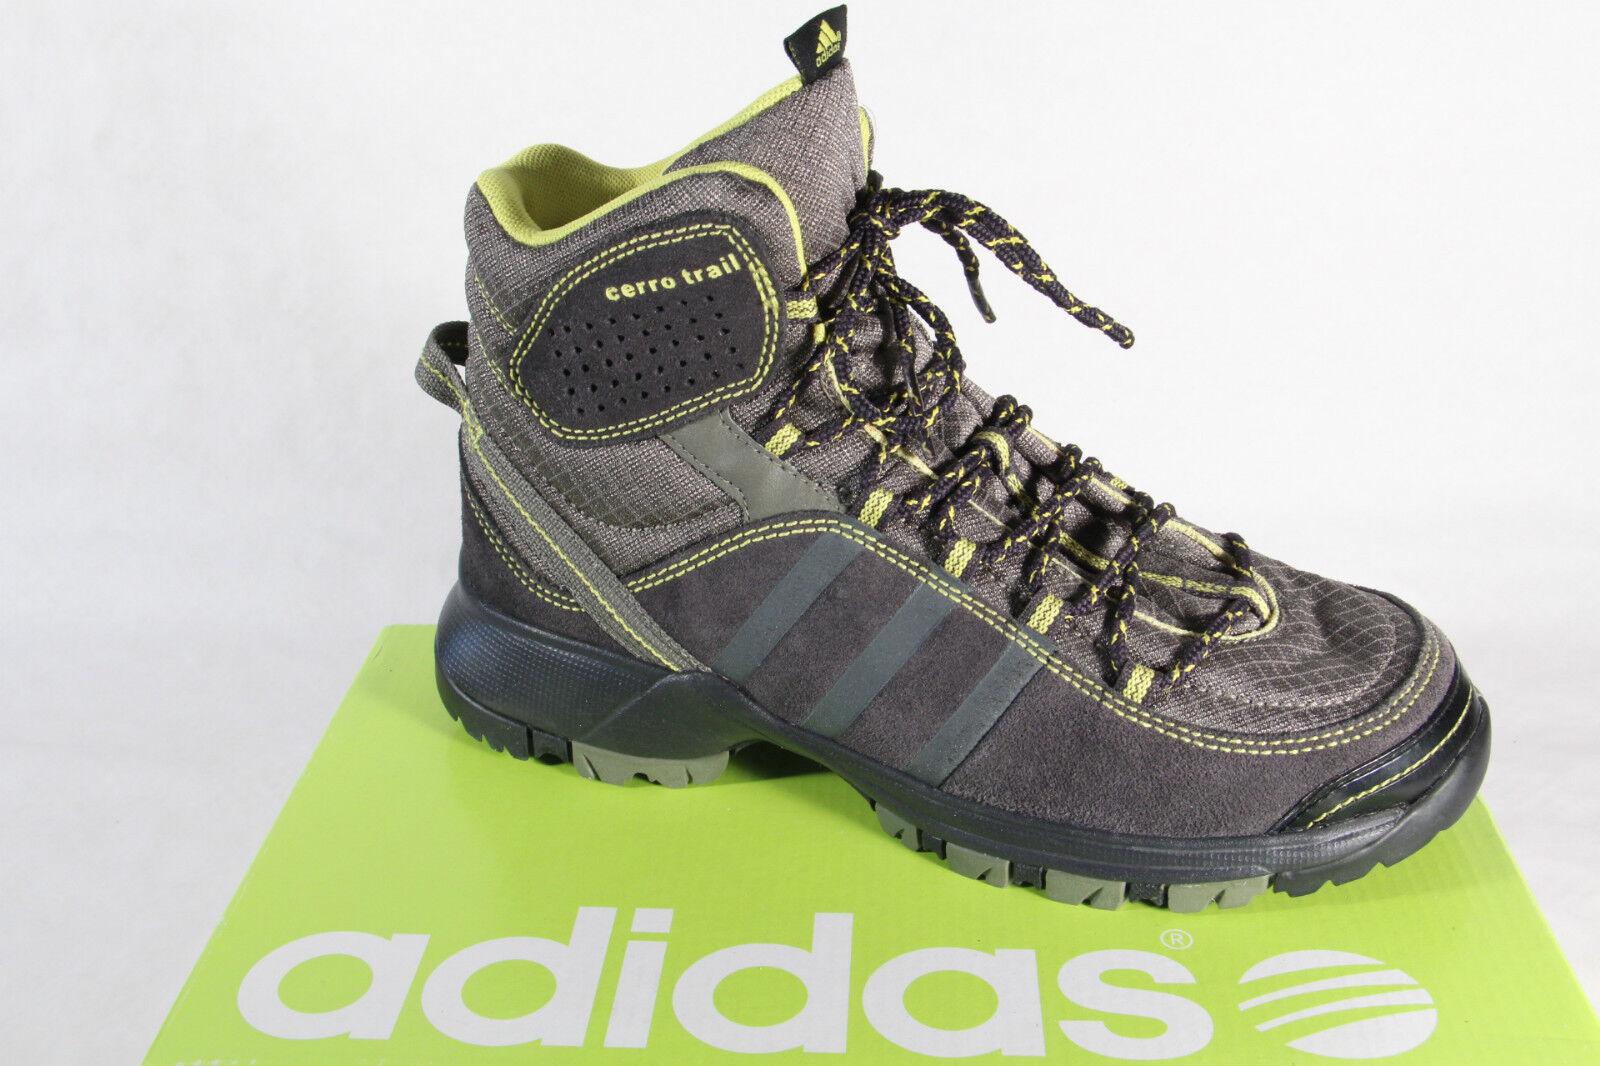 Adidas Stivali Impermeabile pelleTessile GrigioGiallo Nuovo